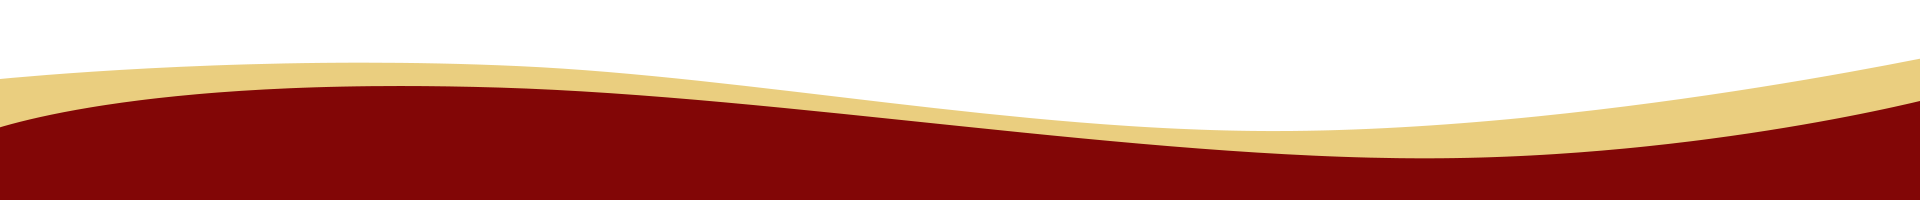 gsa-wave